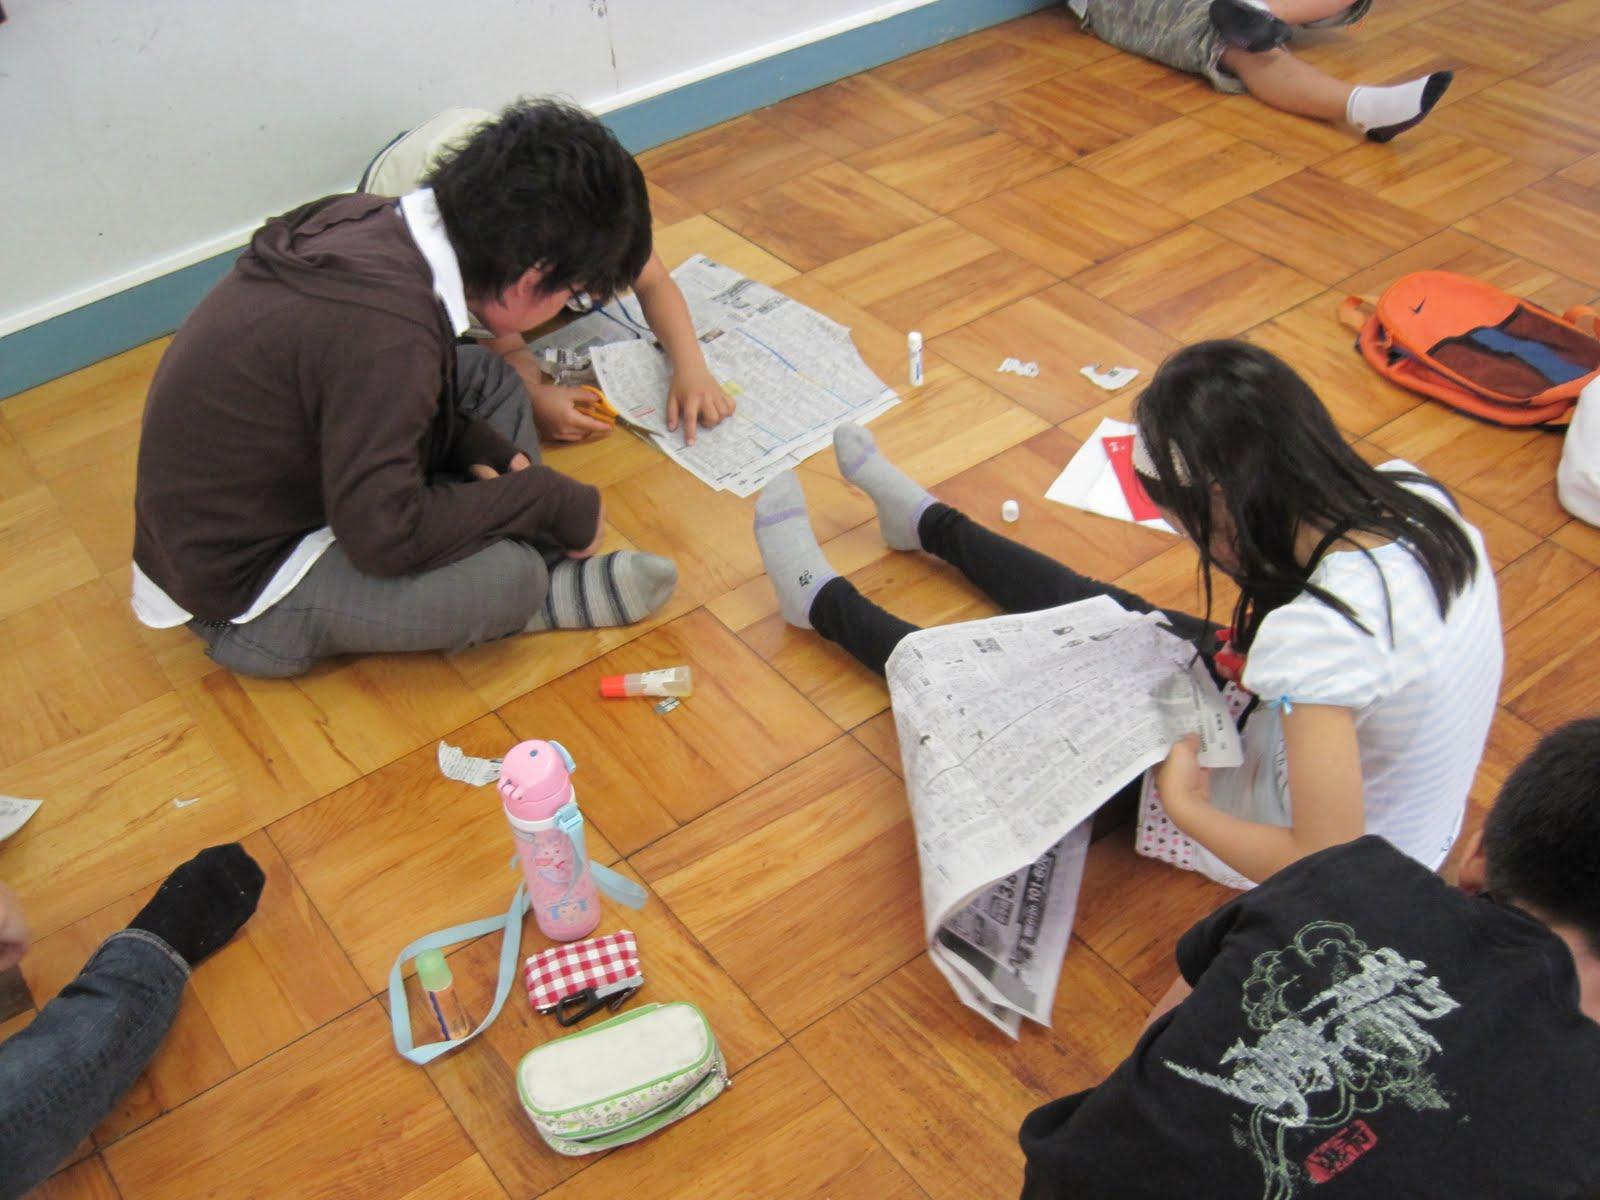 東京熱(TOKYO-HOT) 第92姦 [無断転載禁止]©bbspink.comYouTube動画>9本 ->画像>917枚